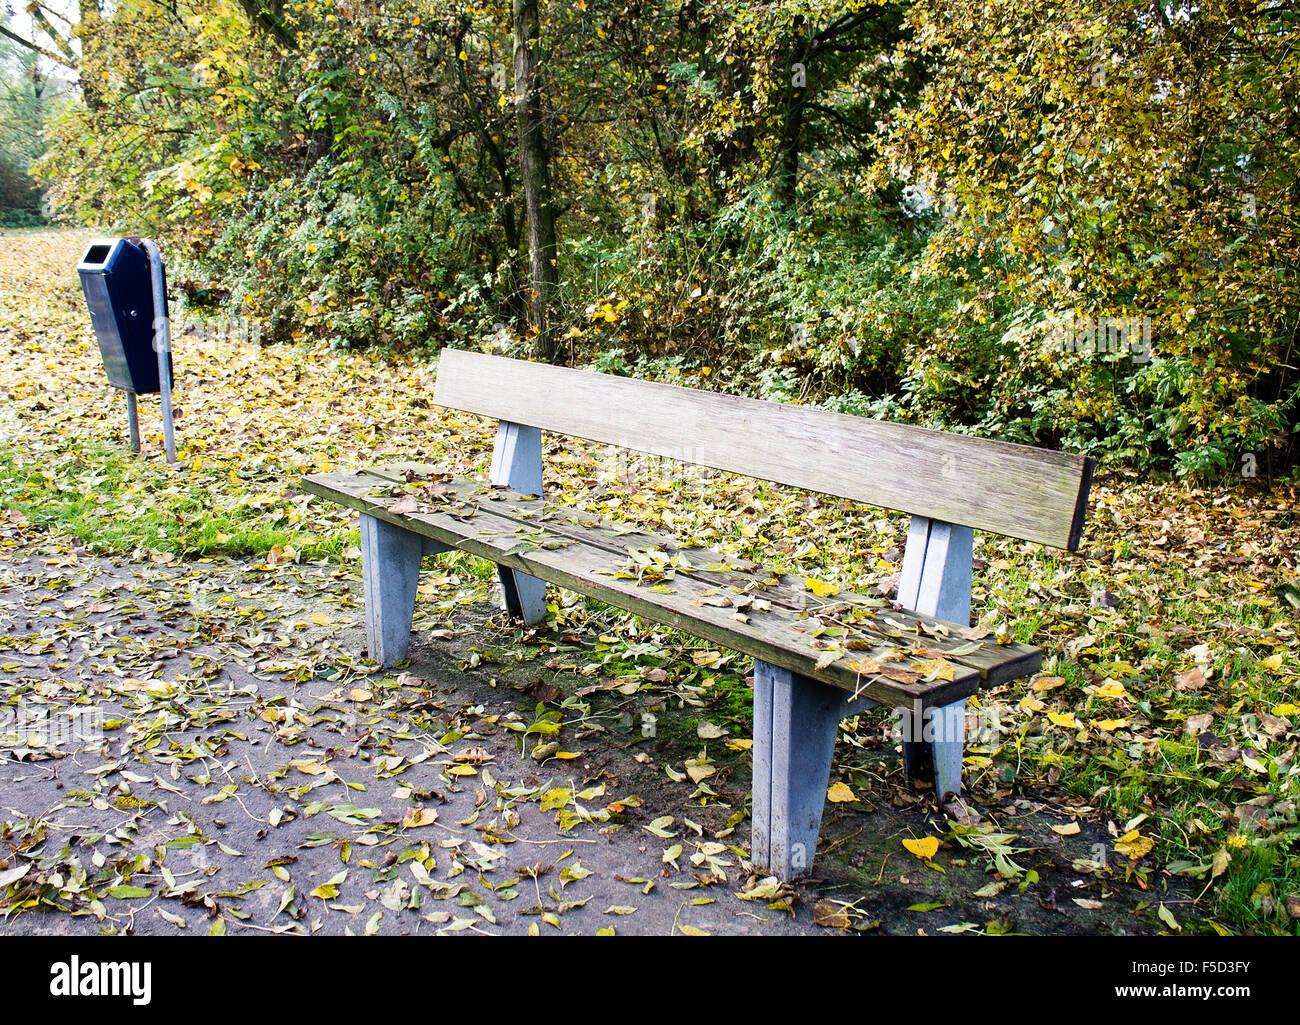 Herbstsaison in Amersfoort park Stockbild